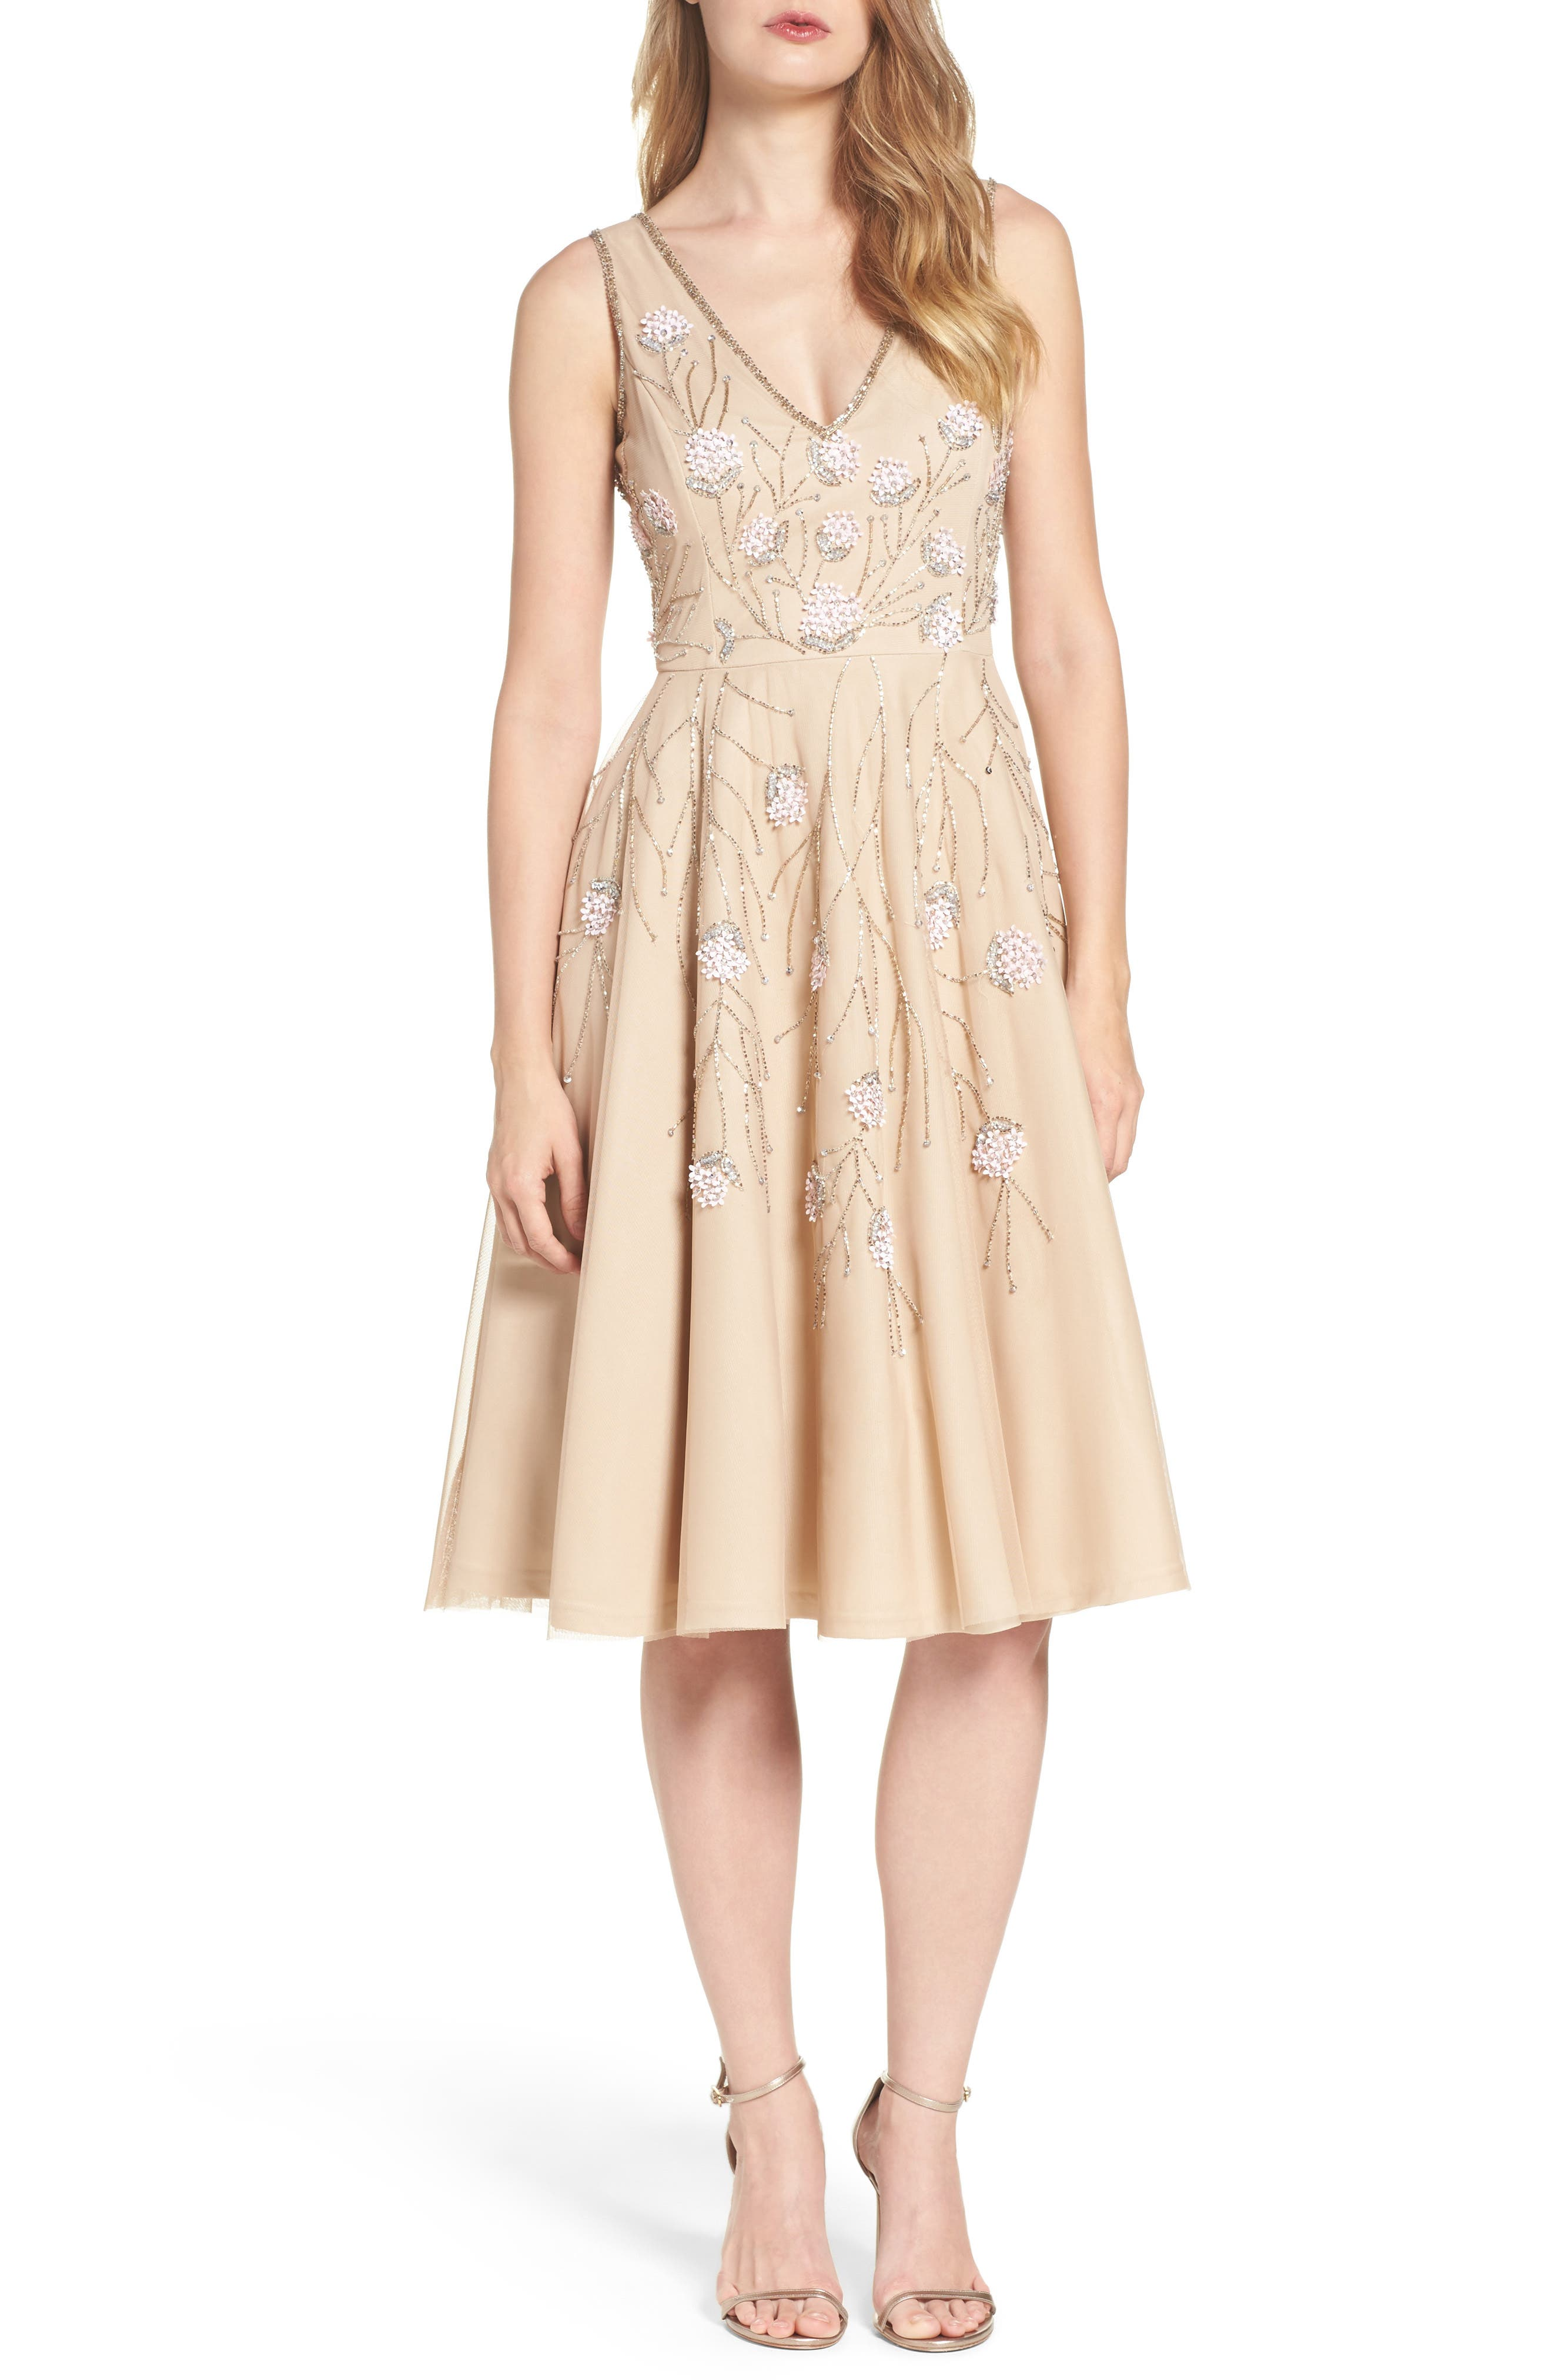 Main Image - Adrianna Papell Embellished Dress